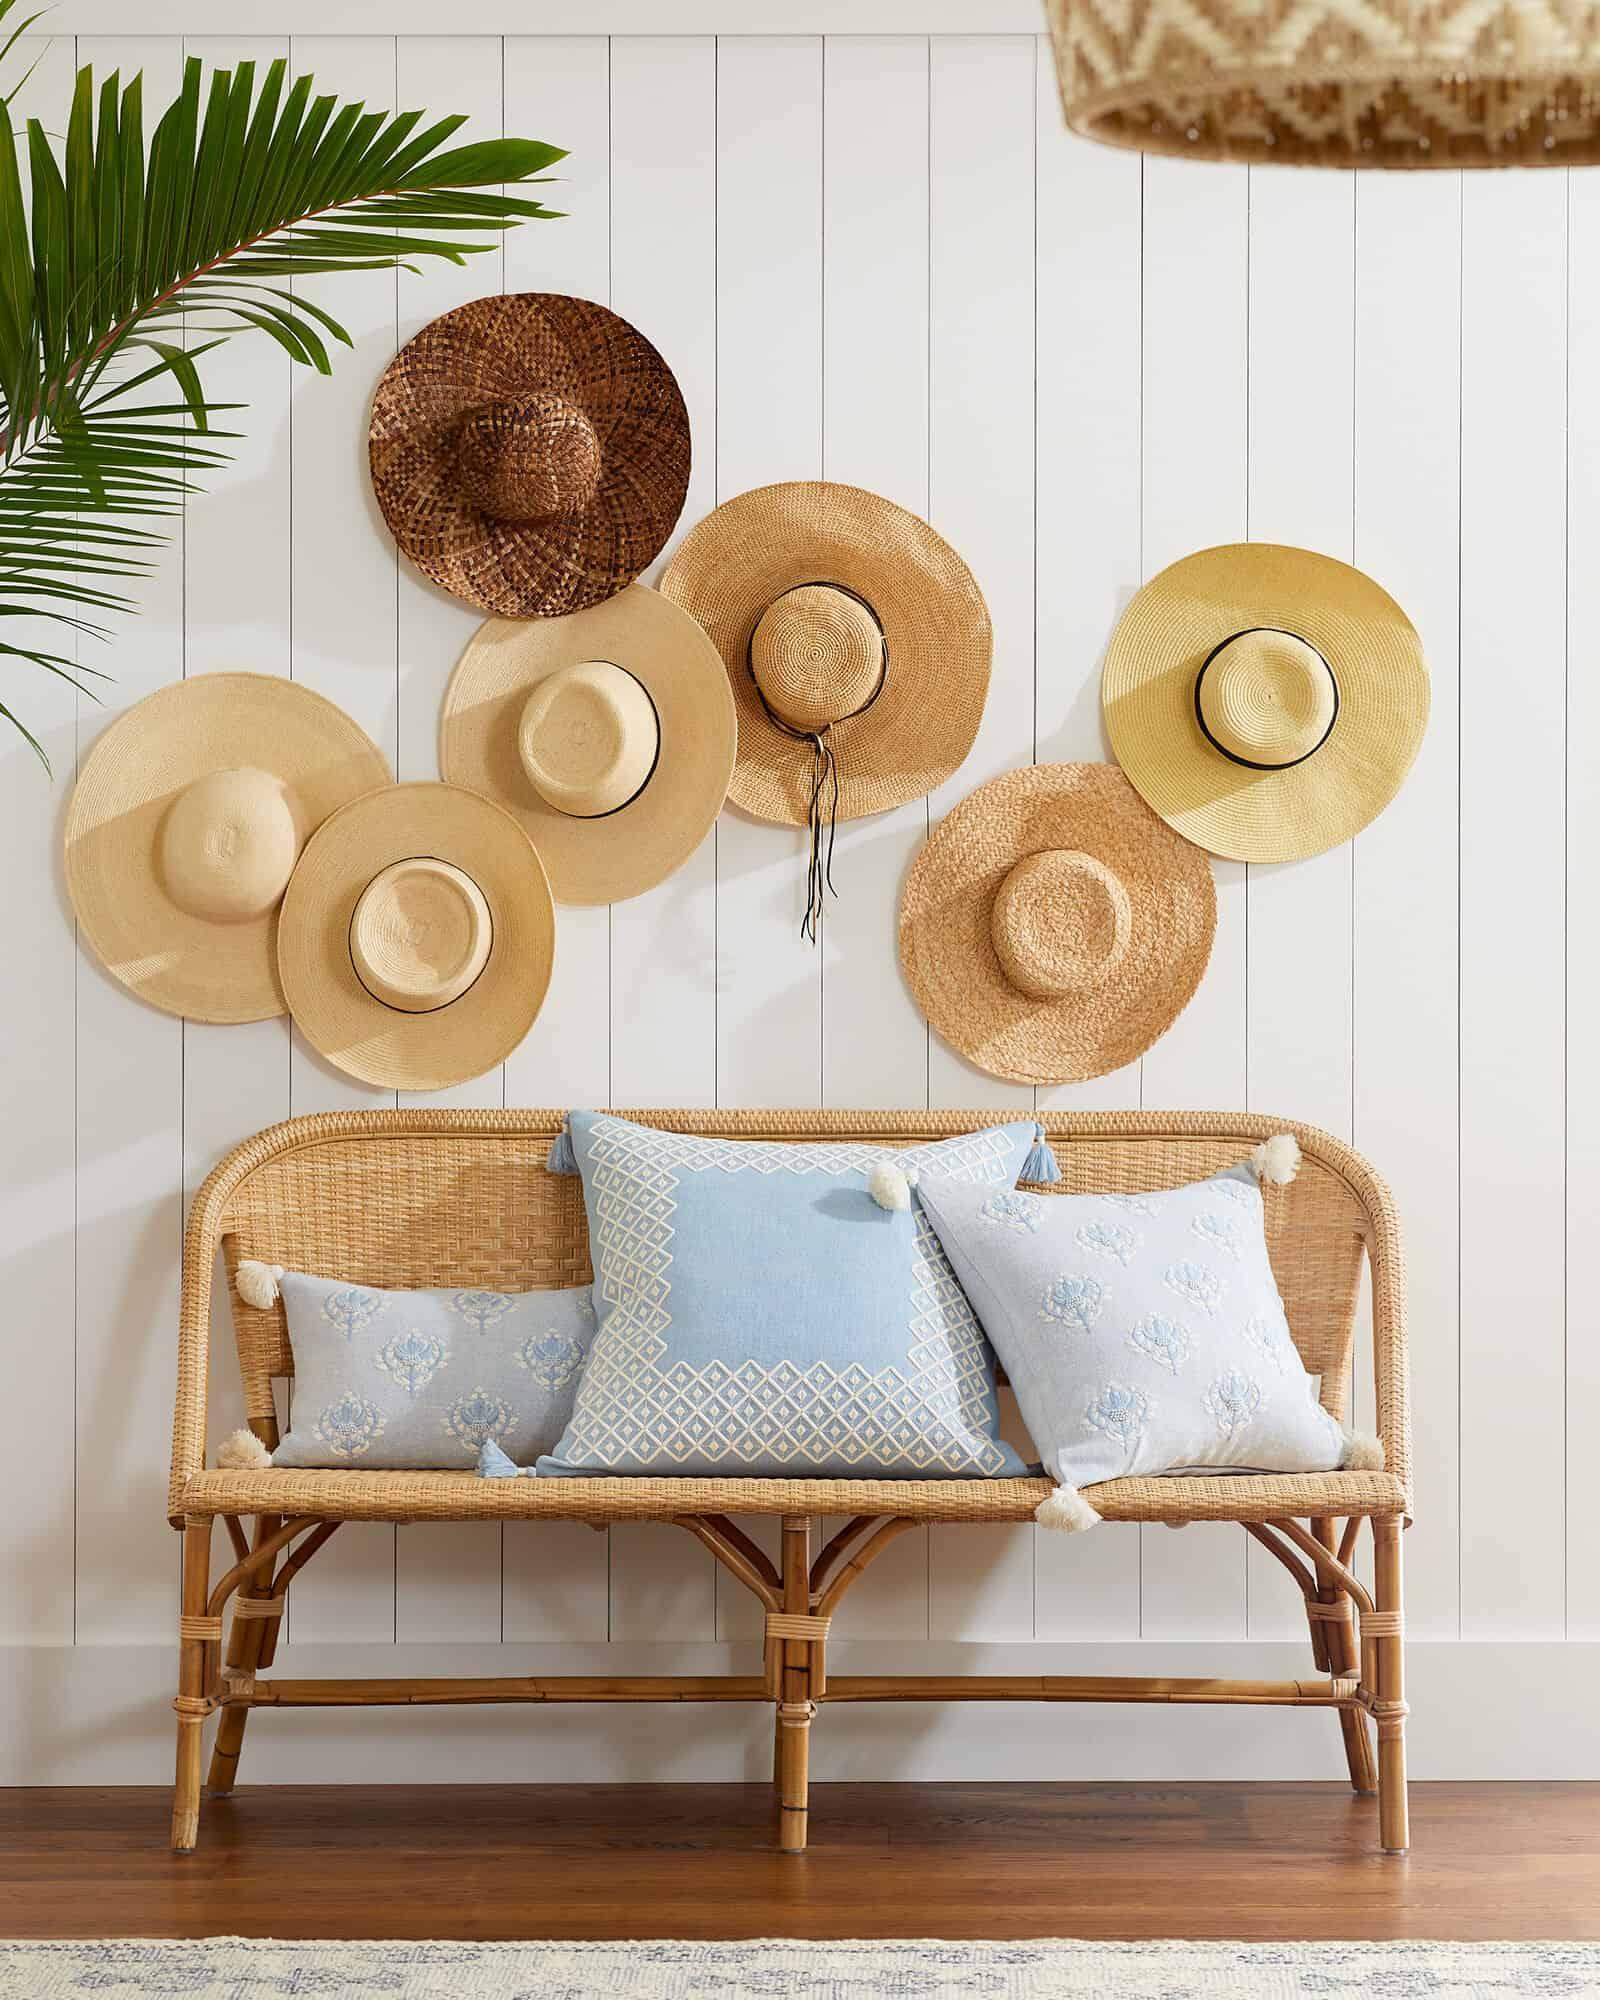 Bonus: Sunwashed Riviera Bench